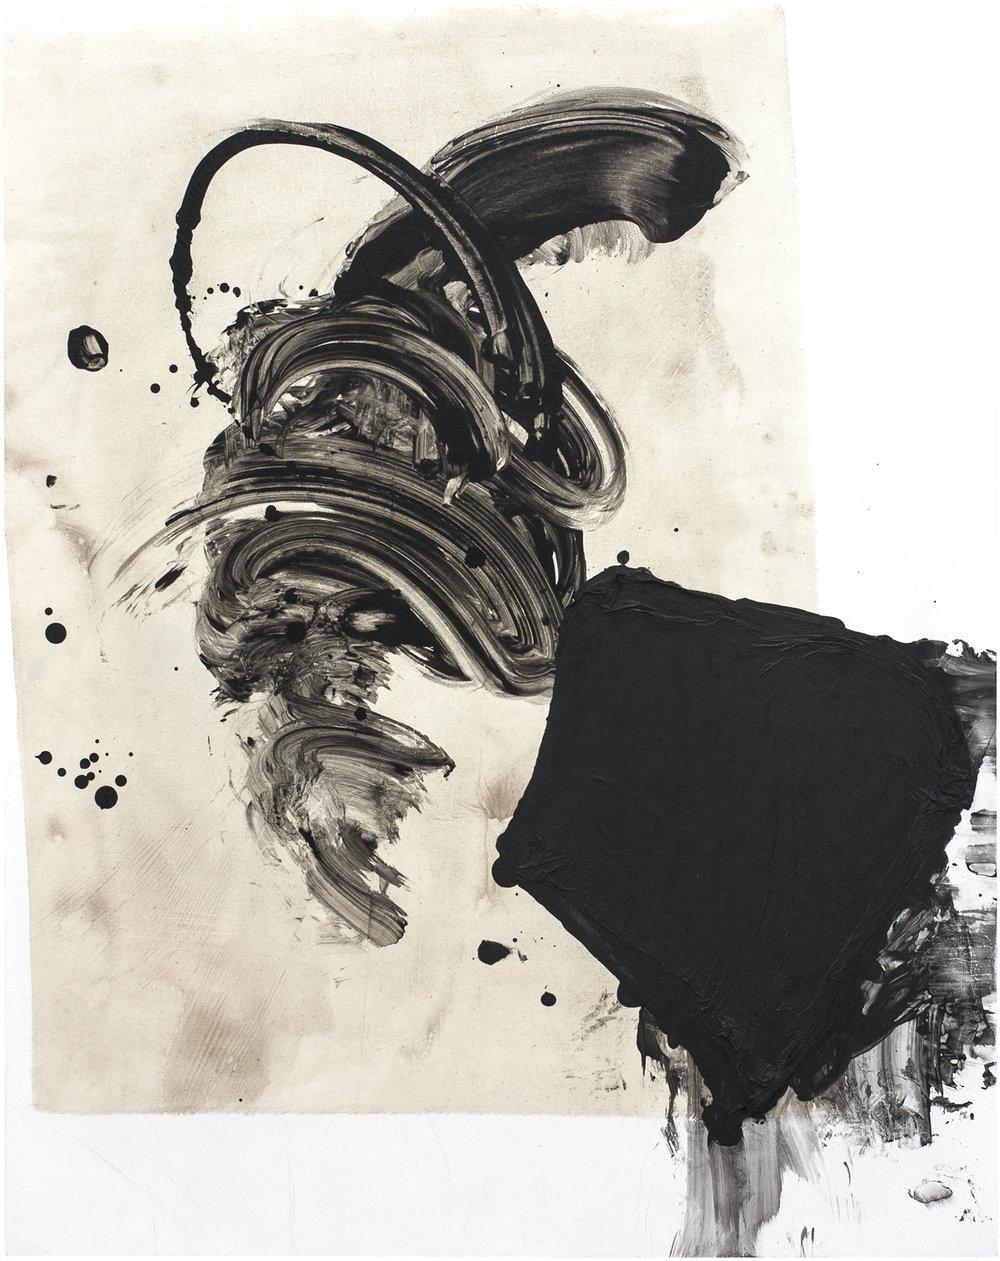 Bulkhead #1, 2012